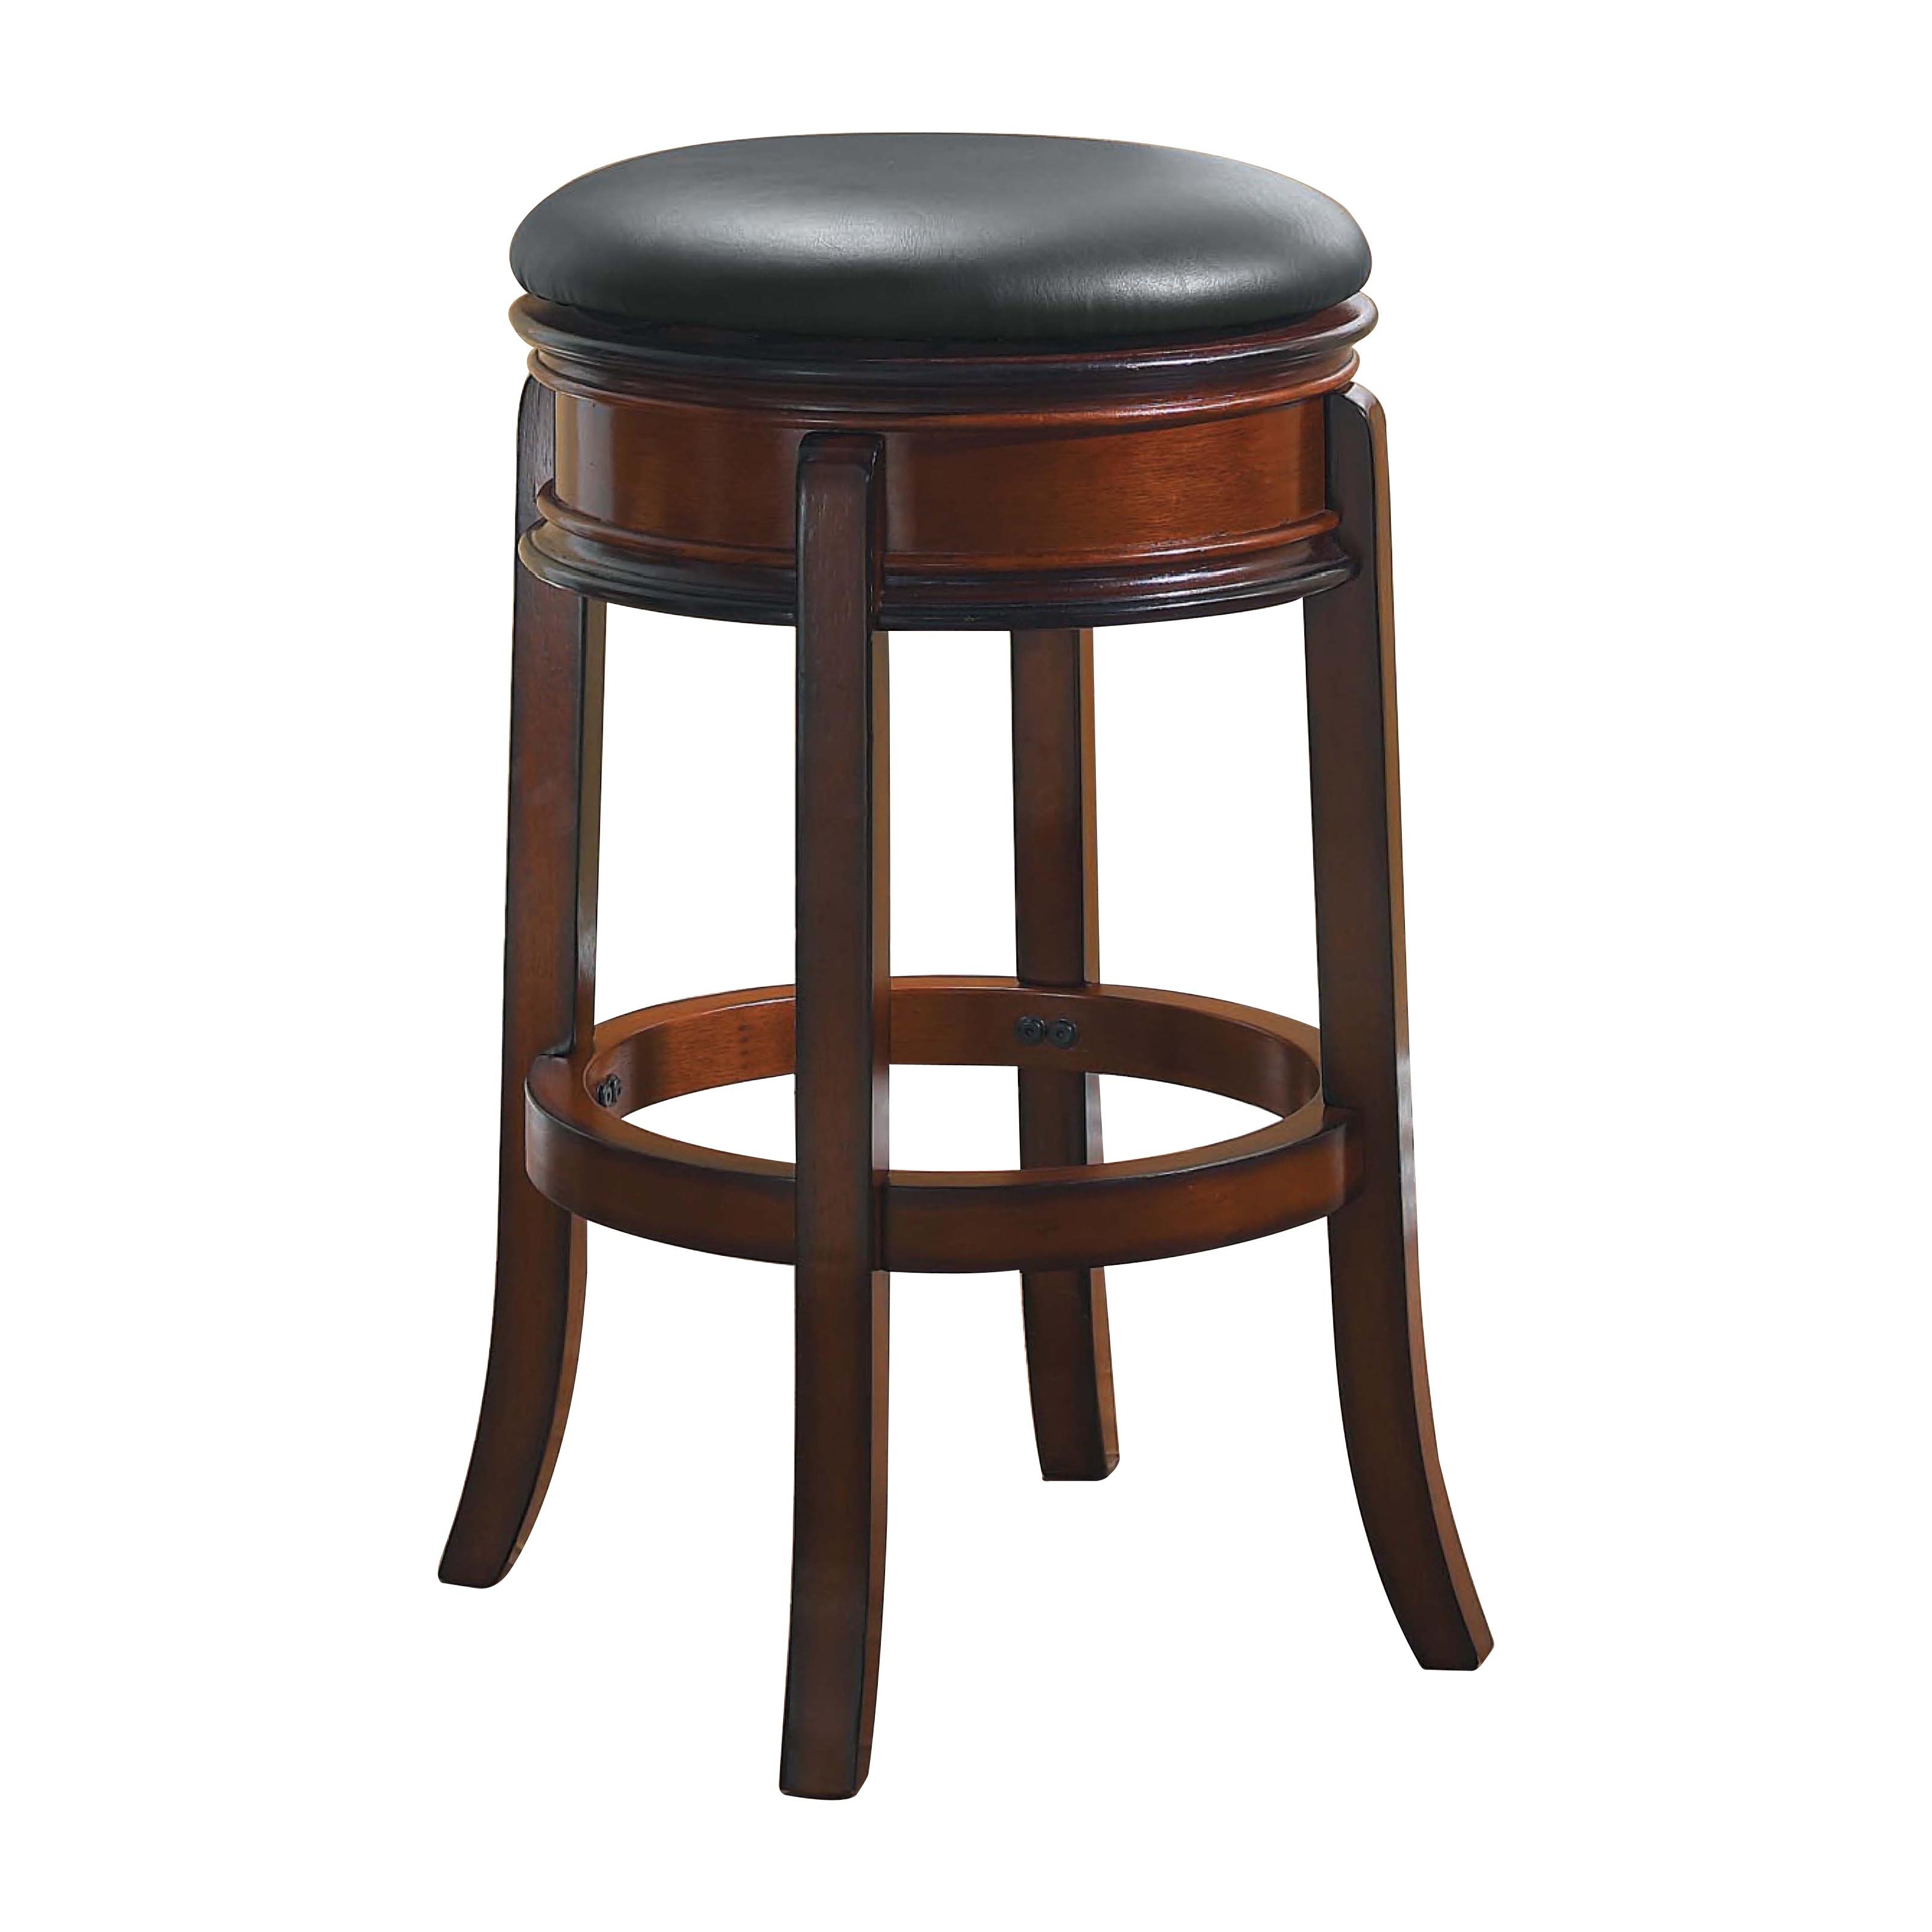 Boraam Magellan 29 in. Backless Swivel Bar Stool - Brandy